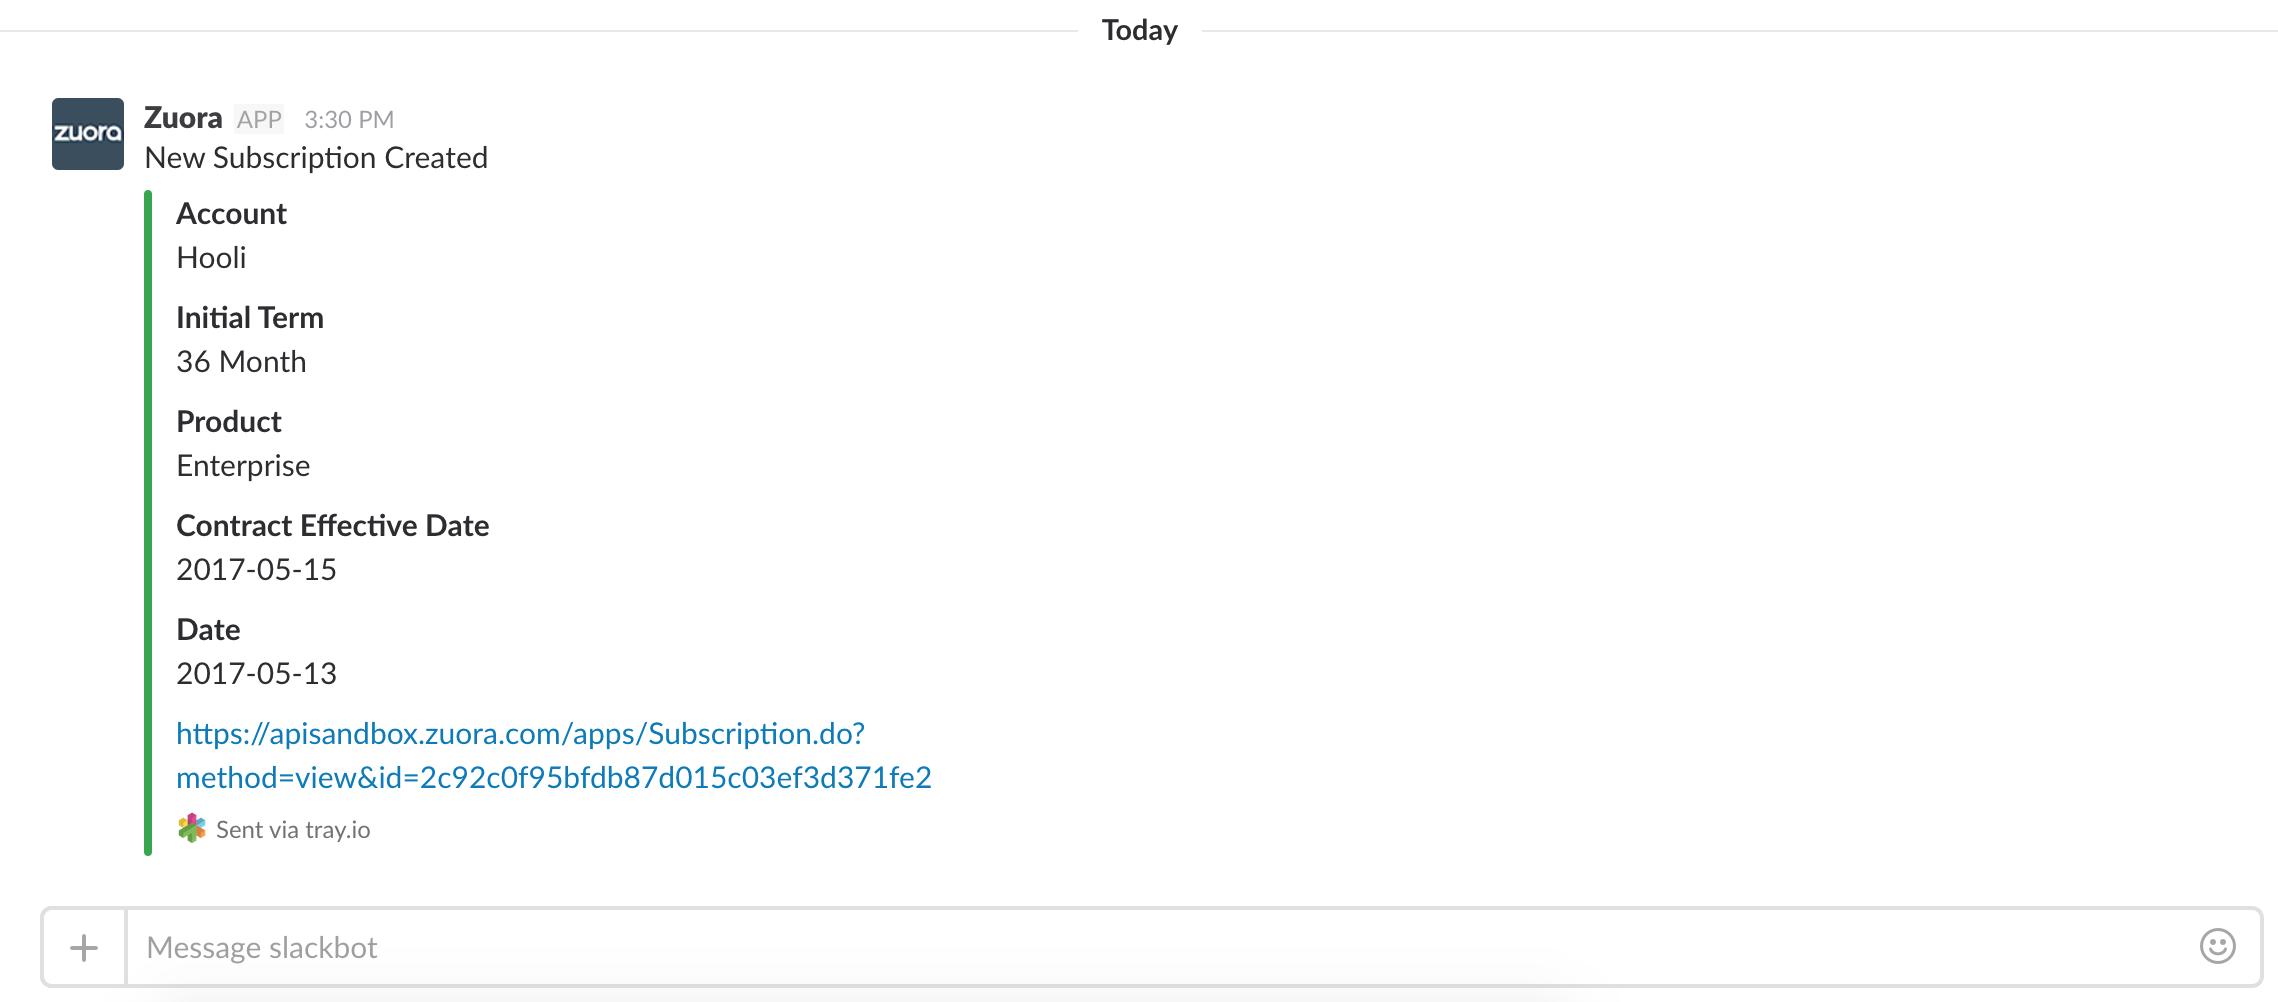 Slack Notifications For Zuora Events Tray Io